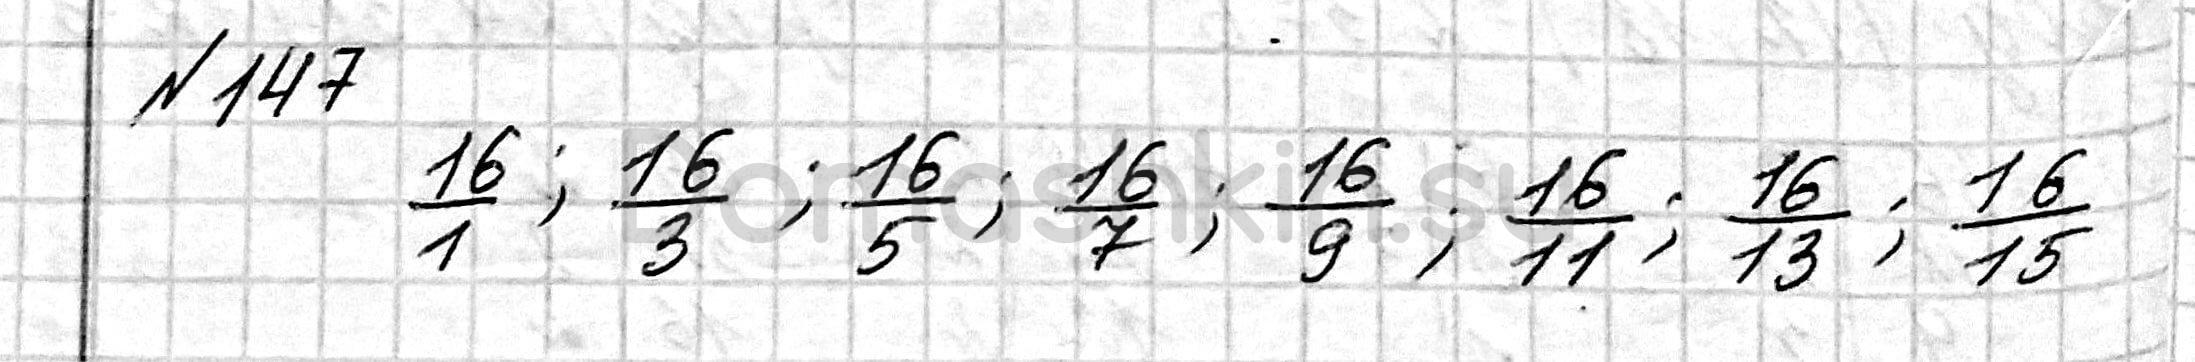 Математика 6 класс учебник Мерзляк номер 147 решение